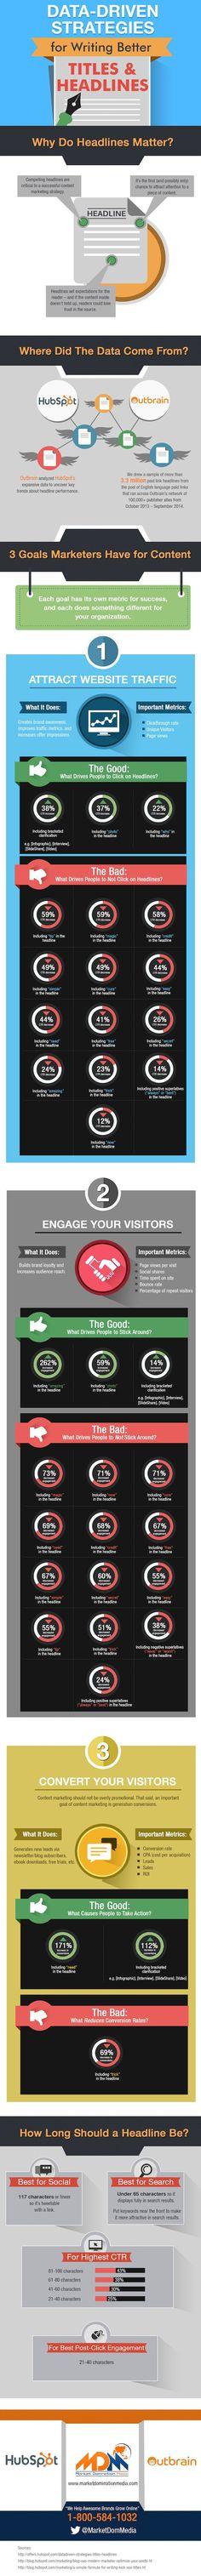 Data-Driven Strategies for Writing Better Titles & Headlines [Infographic], via @HubSpot